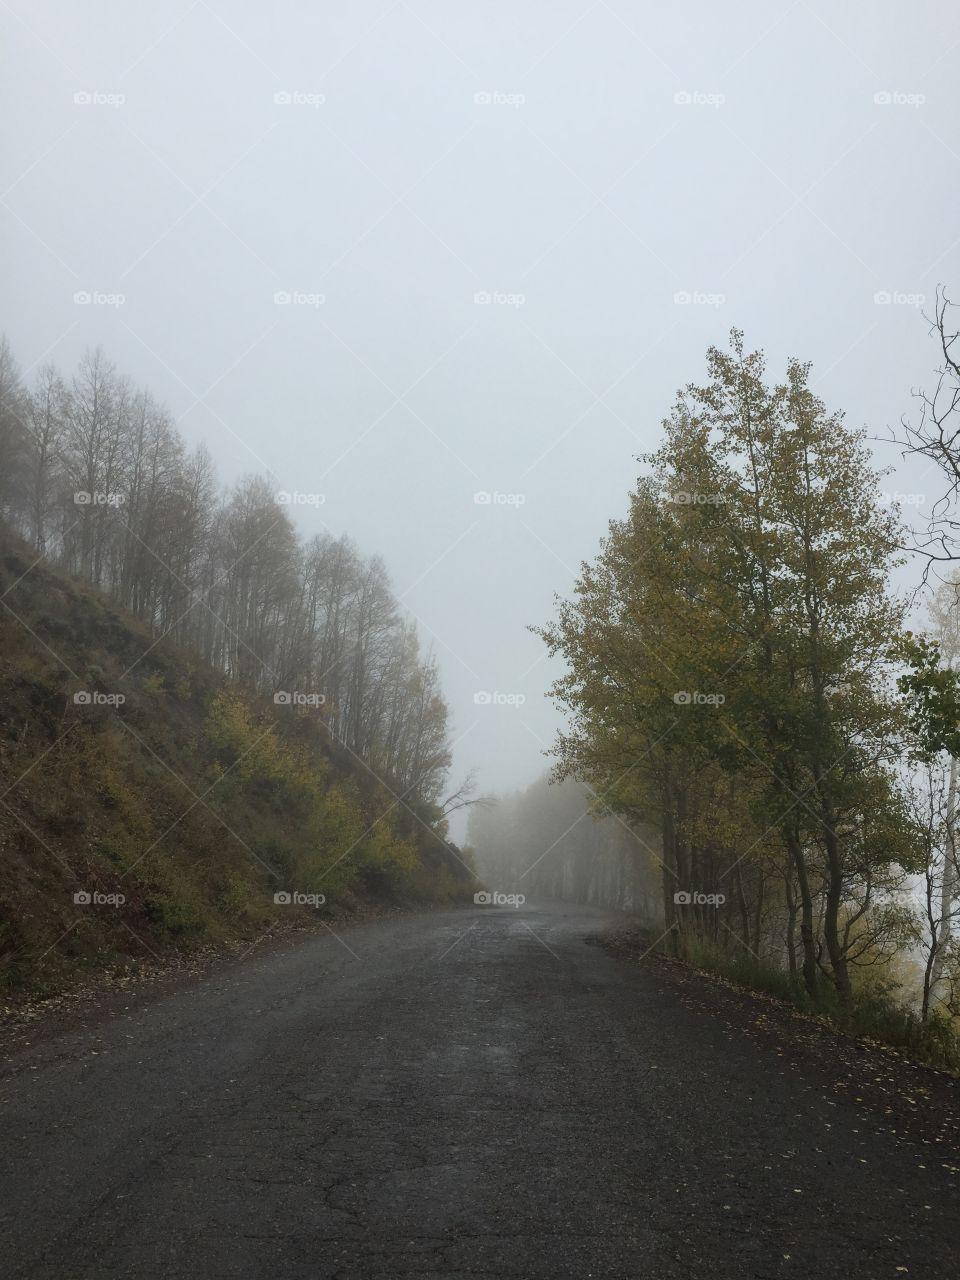 Guardsmen pass. Back side of summit on foggy rainy autumn day